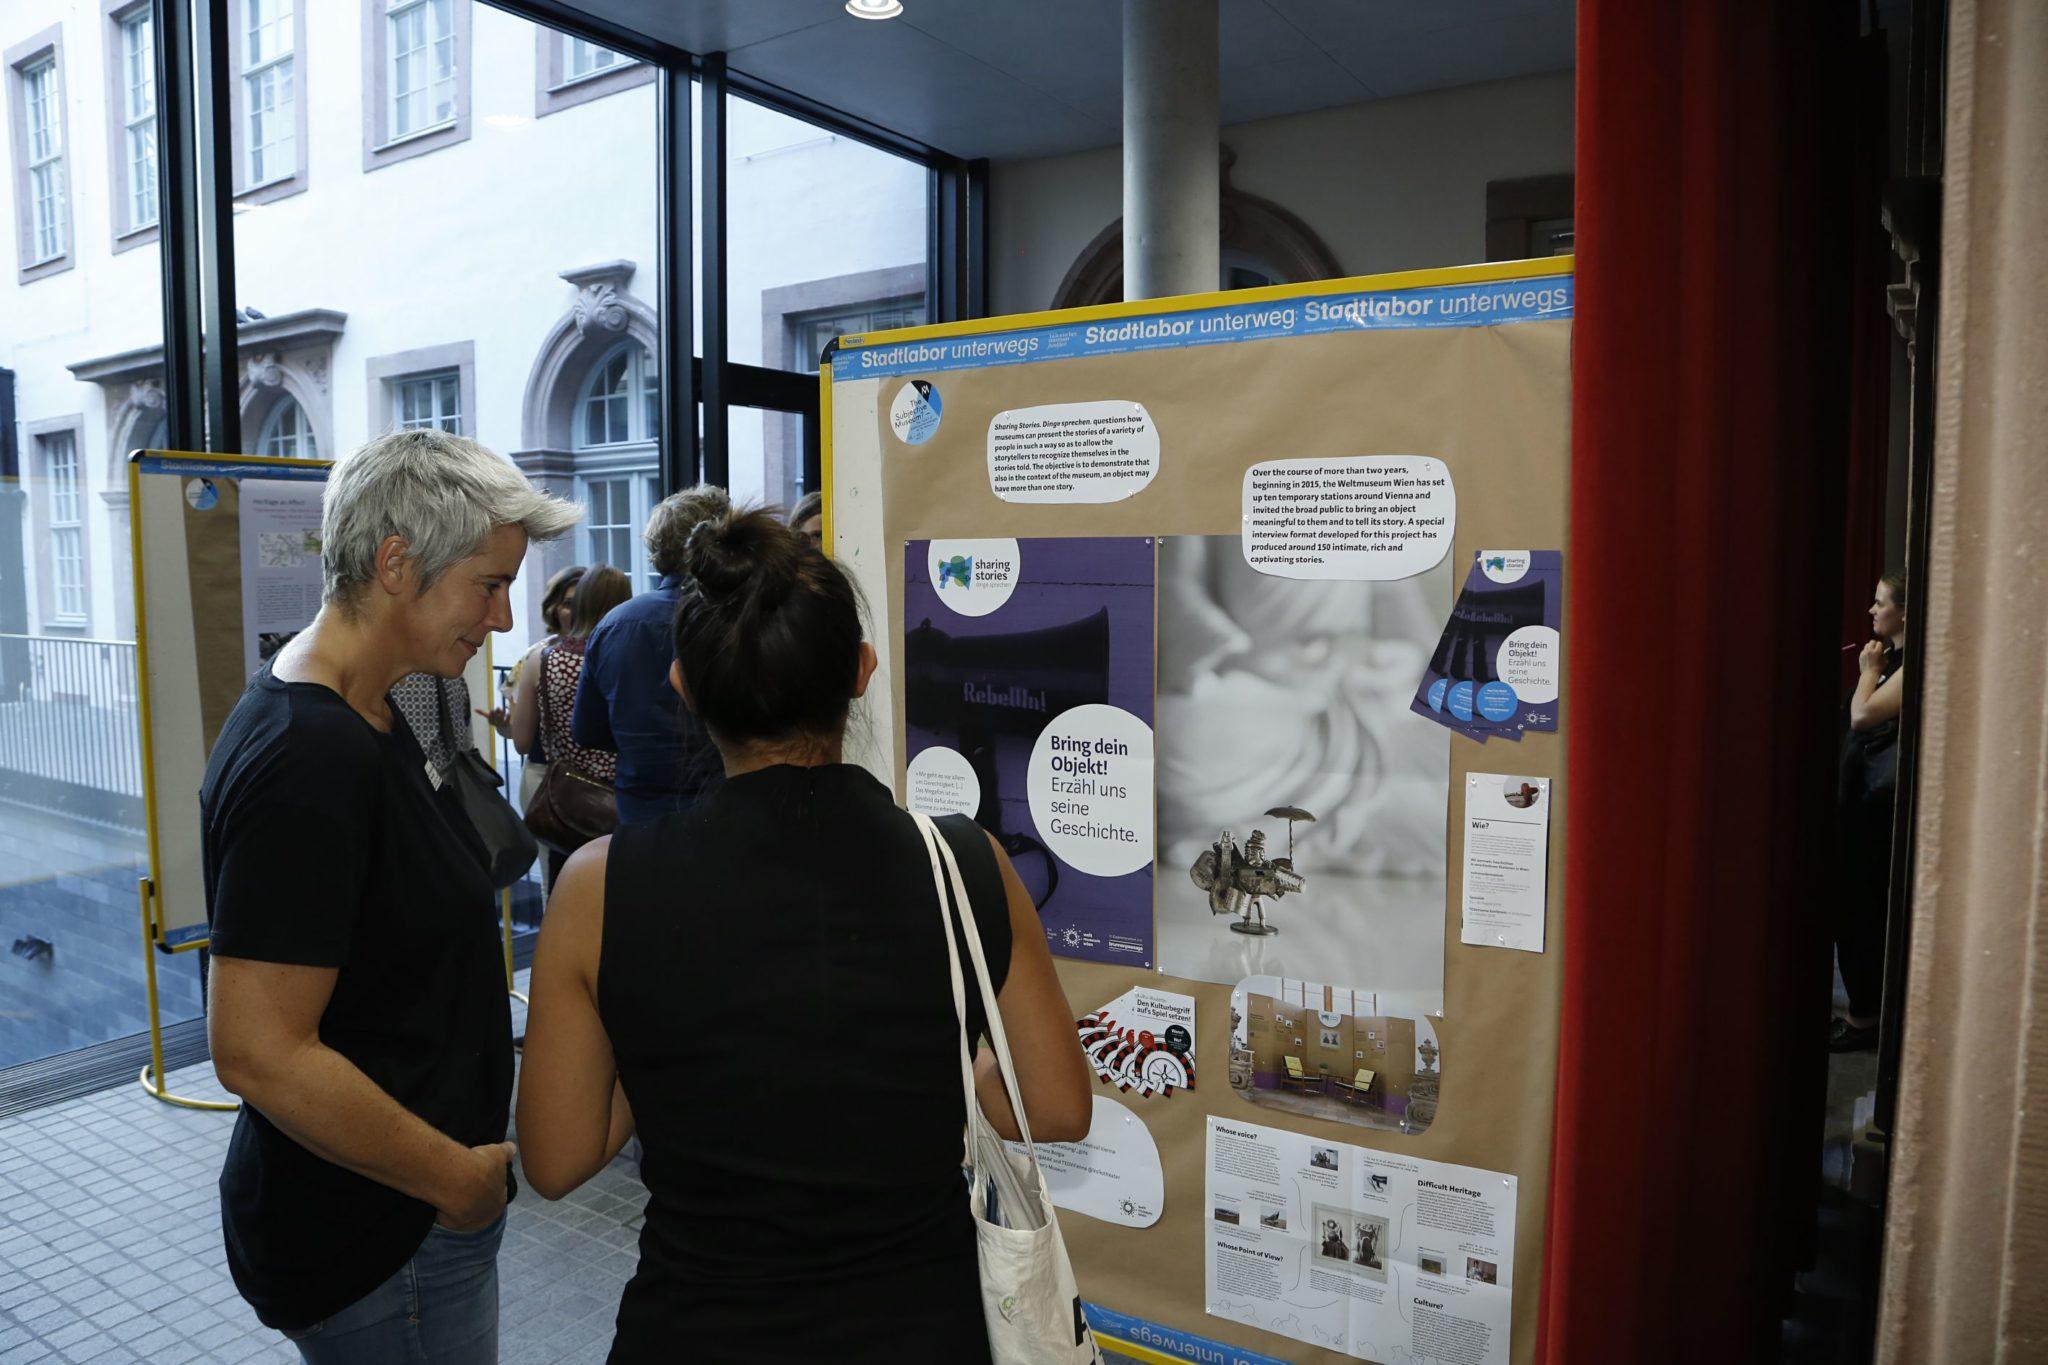 historisches museum frankfurt: the subjective Museum - Poster exhibition